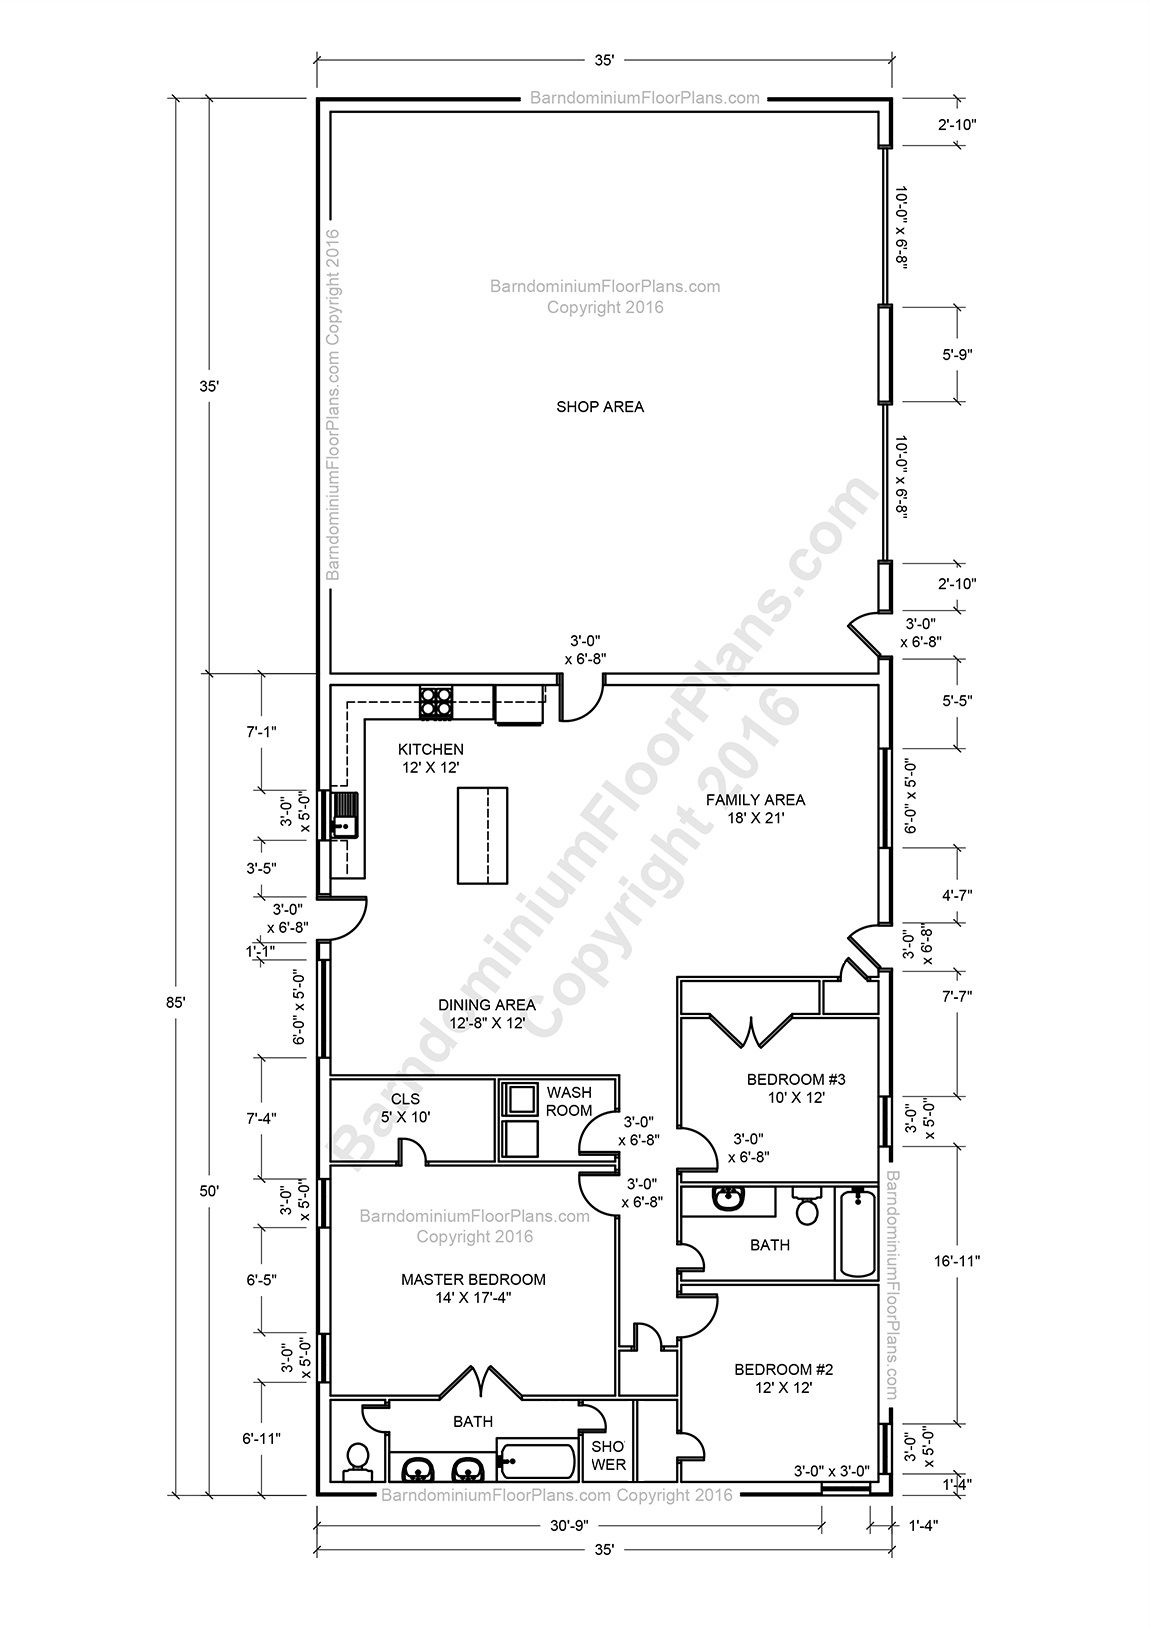 Delightful Barndominium Floor Plans, Pole Barn House Plans And Metal Barn Homes |  Barndominium Floor Plans. Photo Gallery